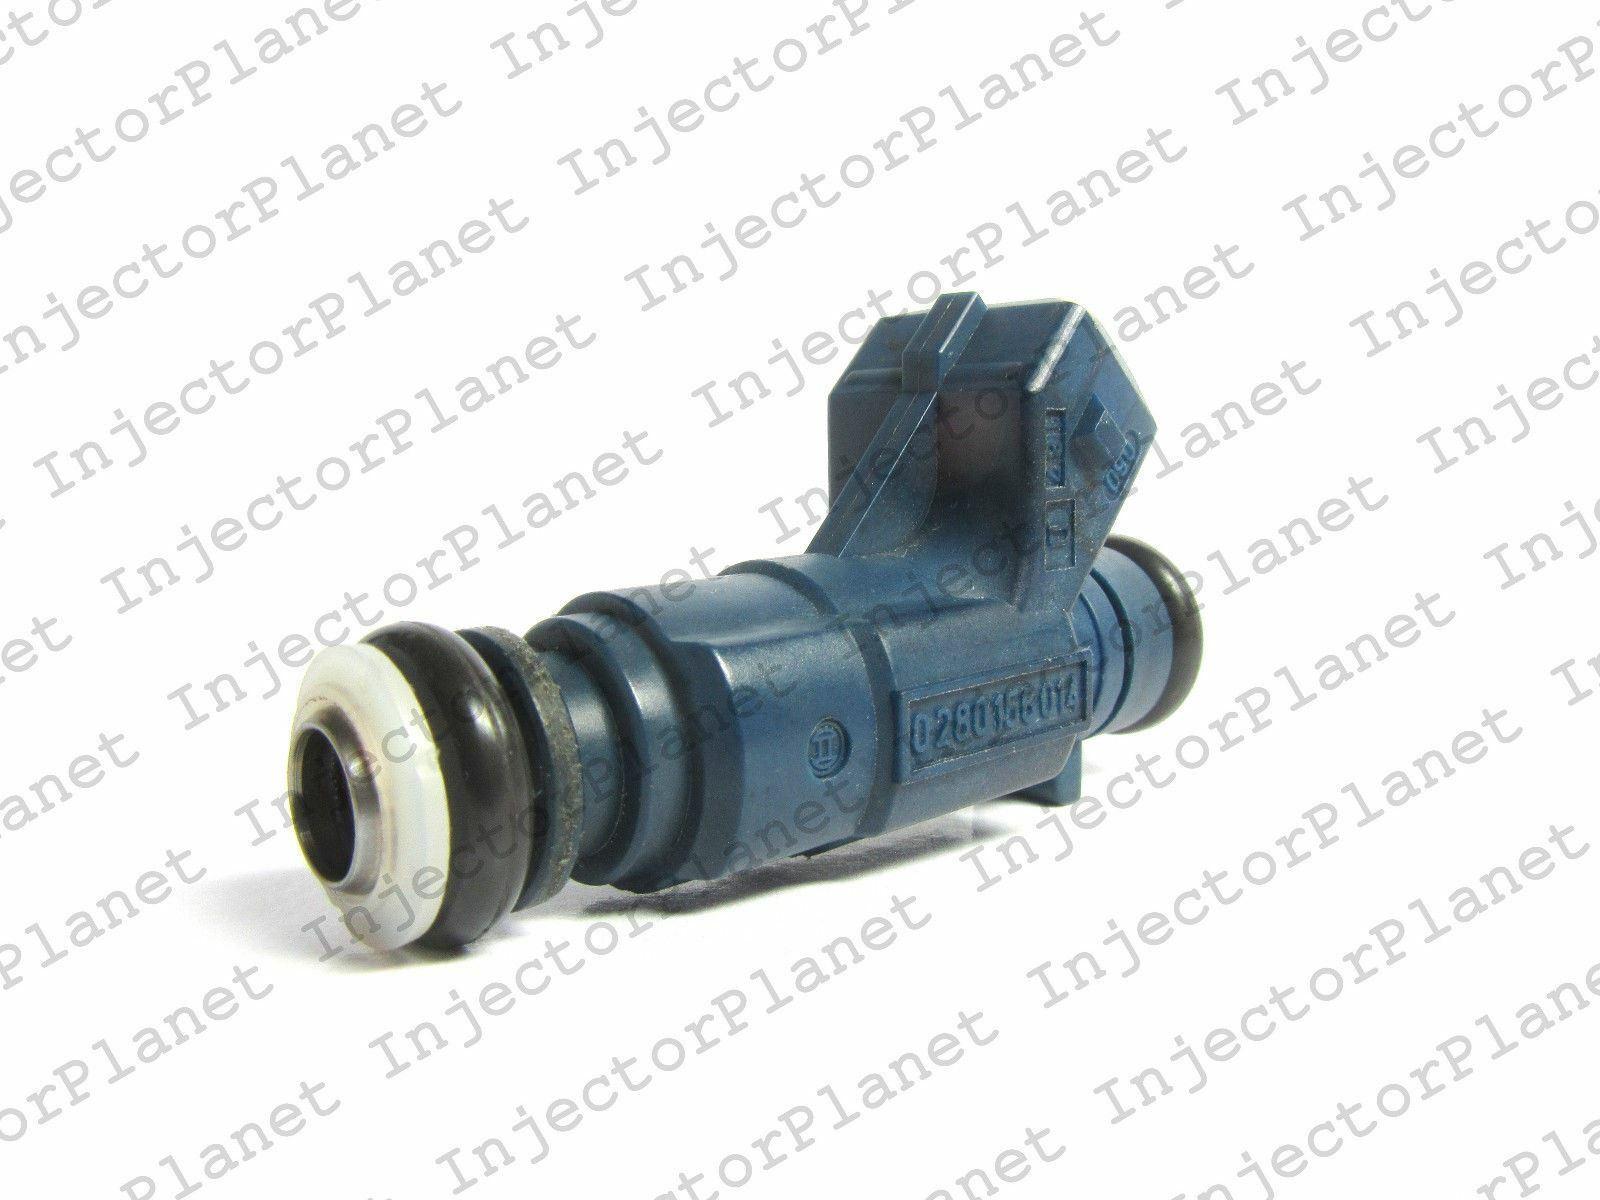 Set of 6 Bosch 0280156014 injector 01-03 Mercedes ML320 M112 3.2L V6 A1120780149